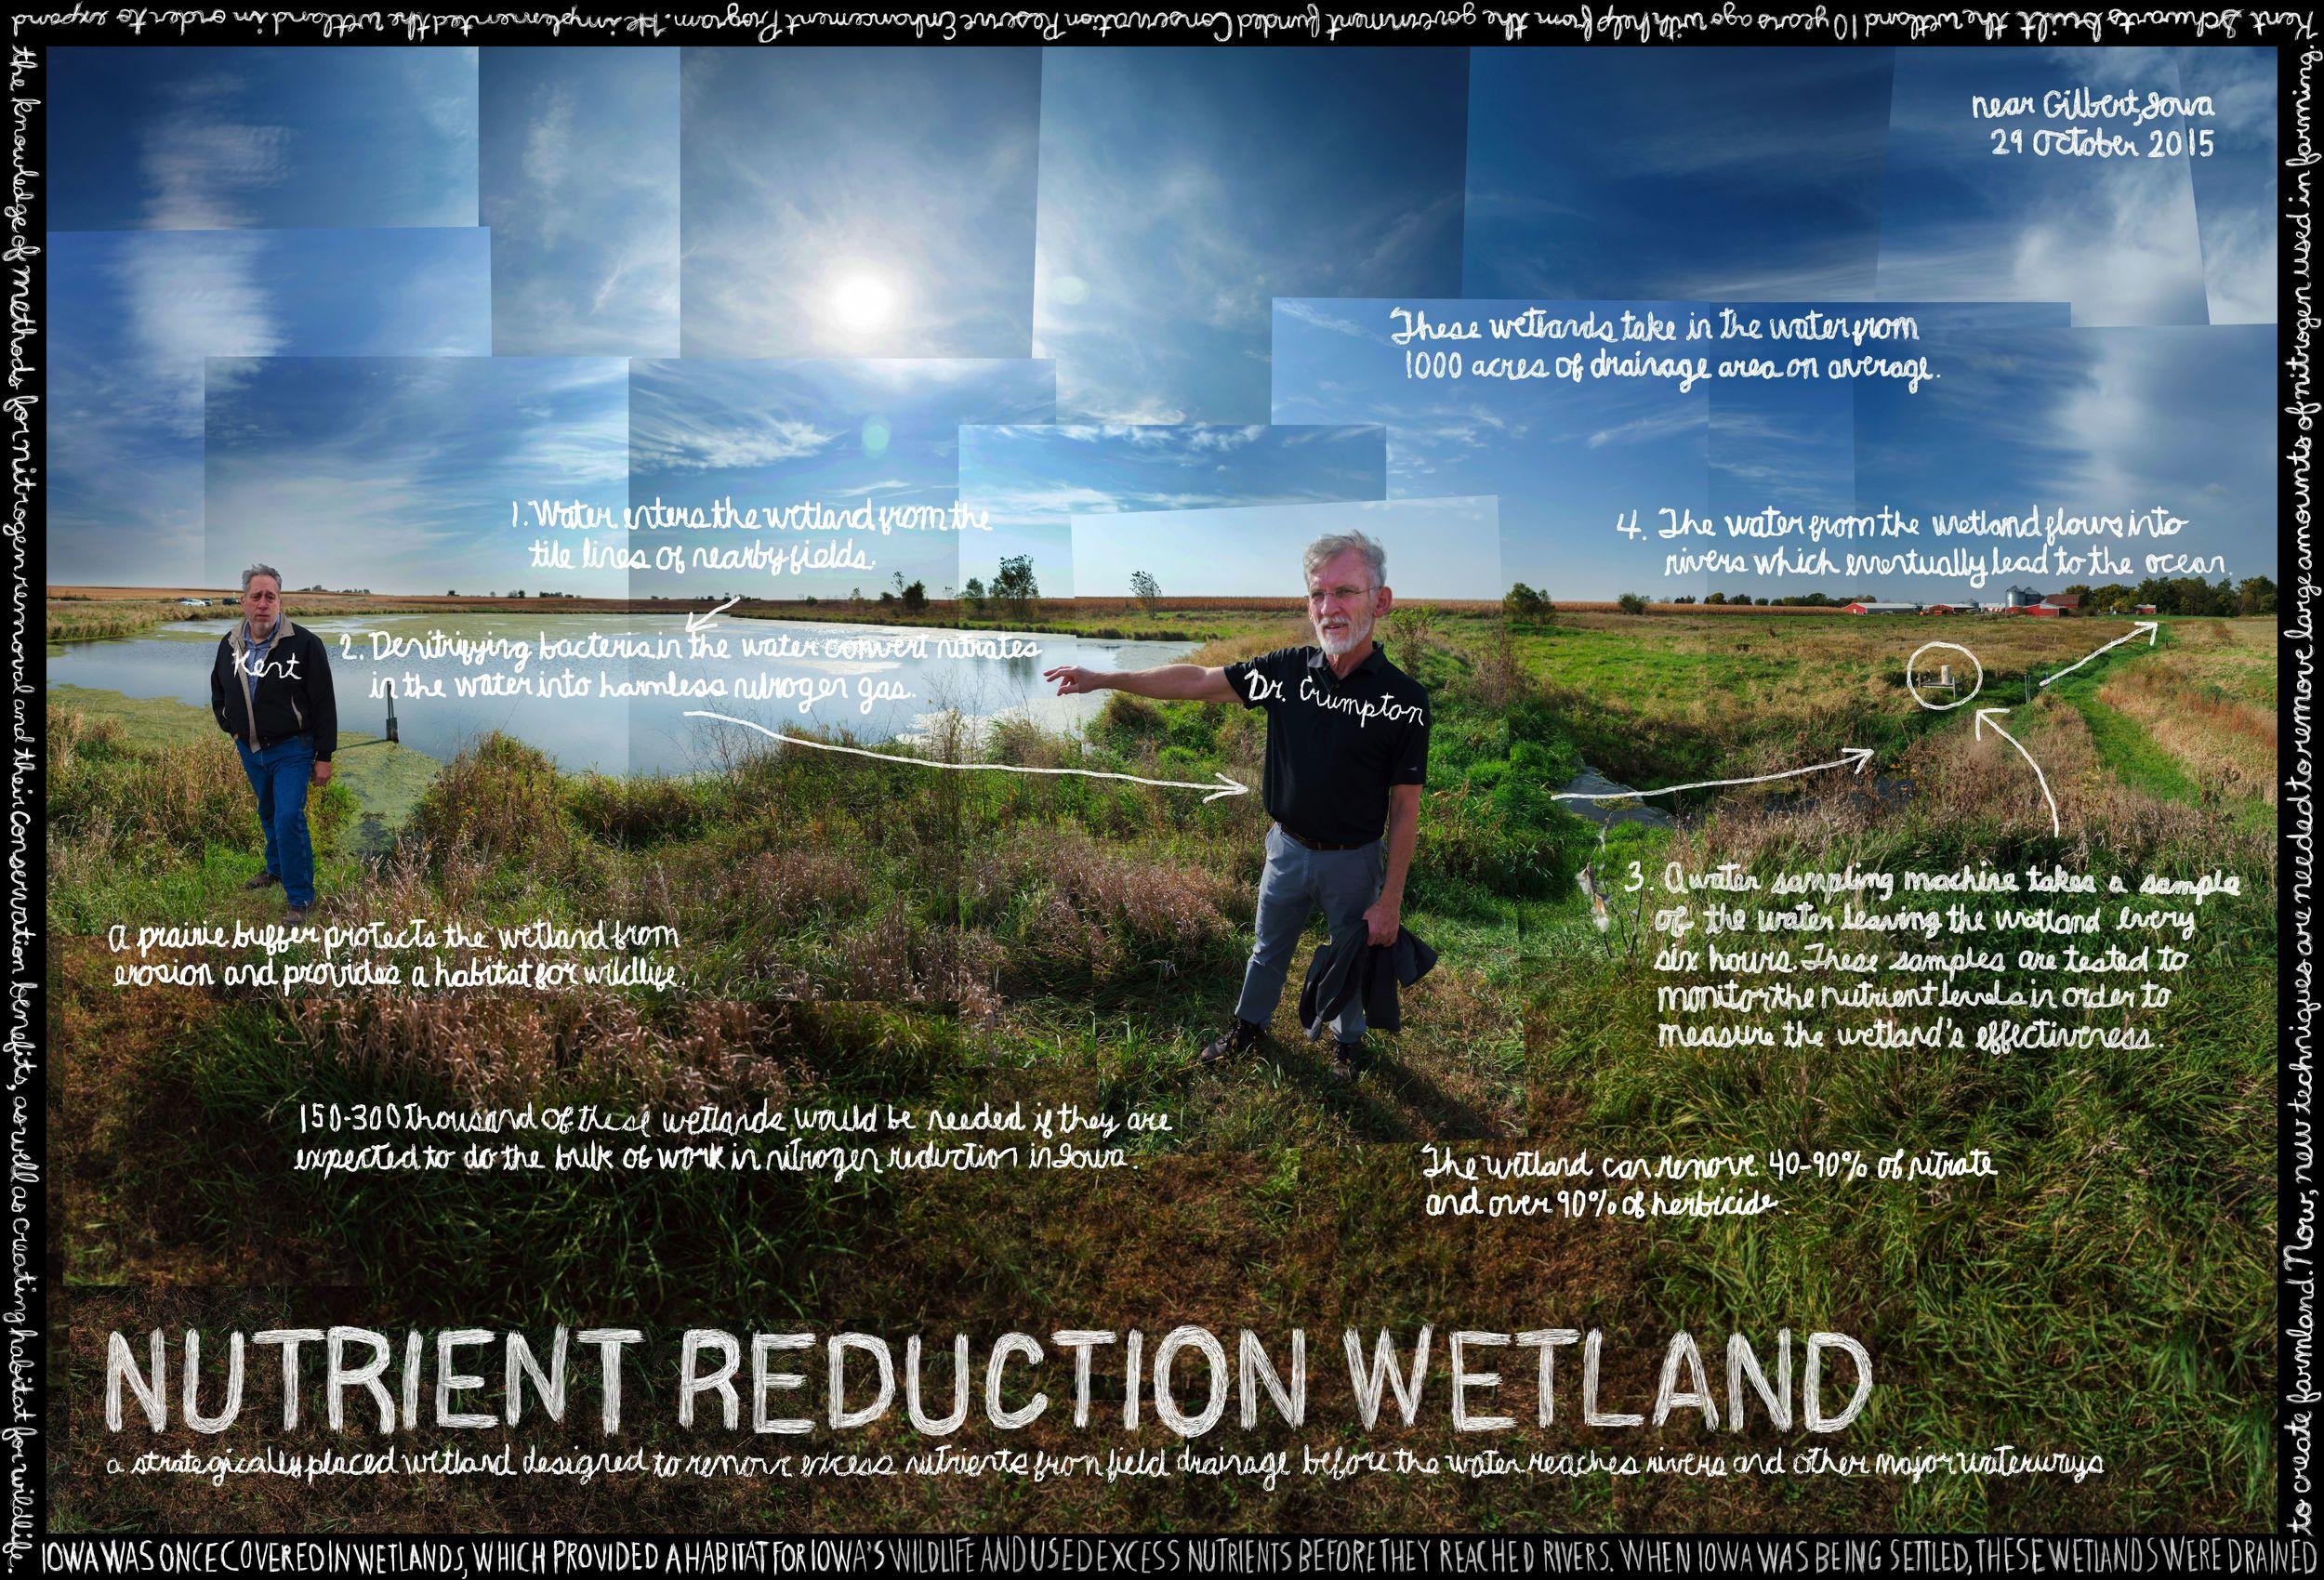 PL_Ames_NutrientReductionWetland_small.jpg